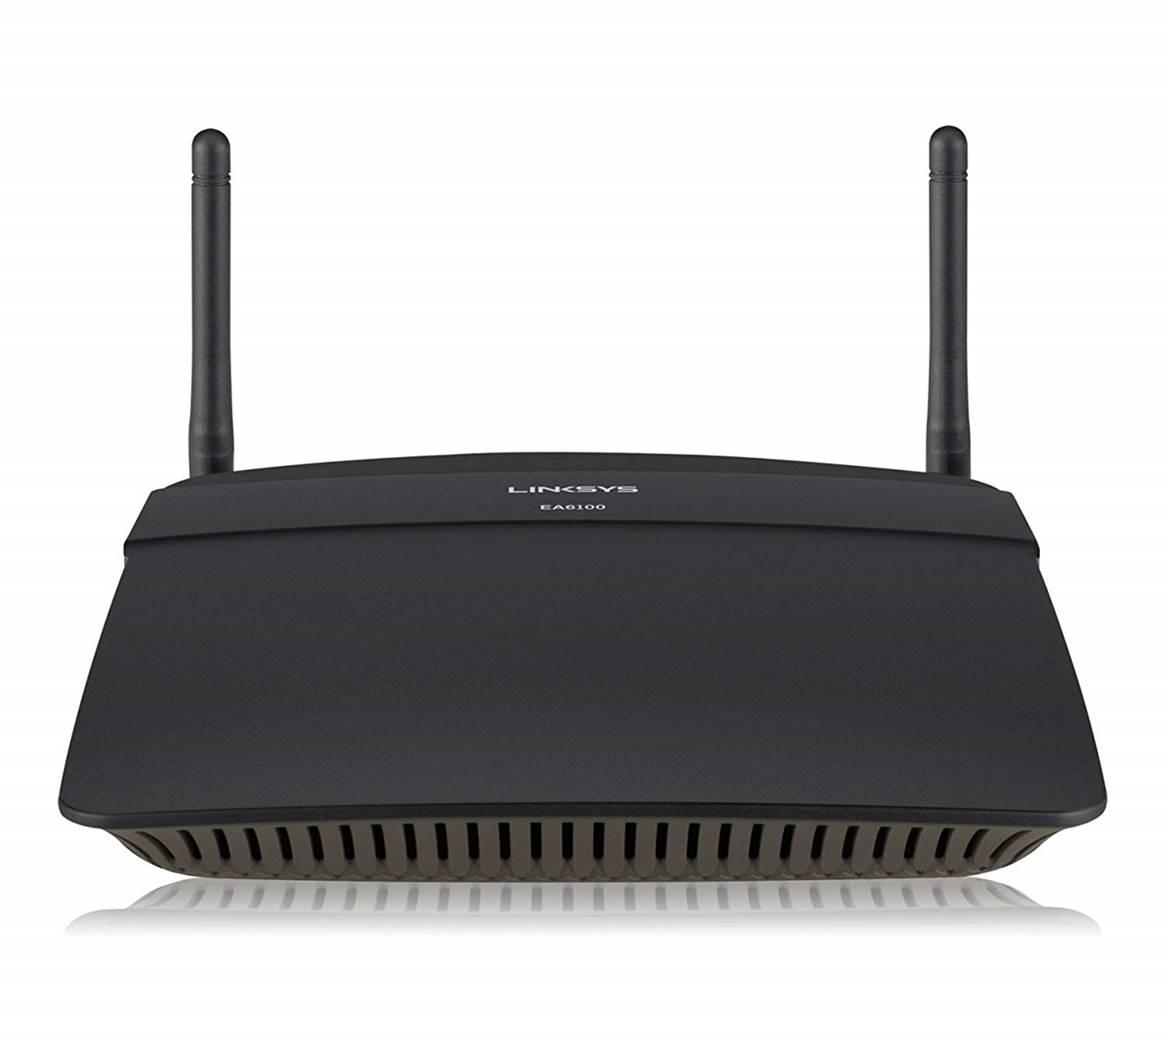 Linksys RE6500 WiFi Extender